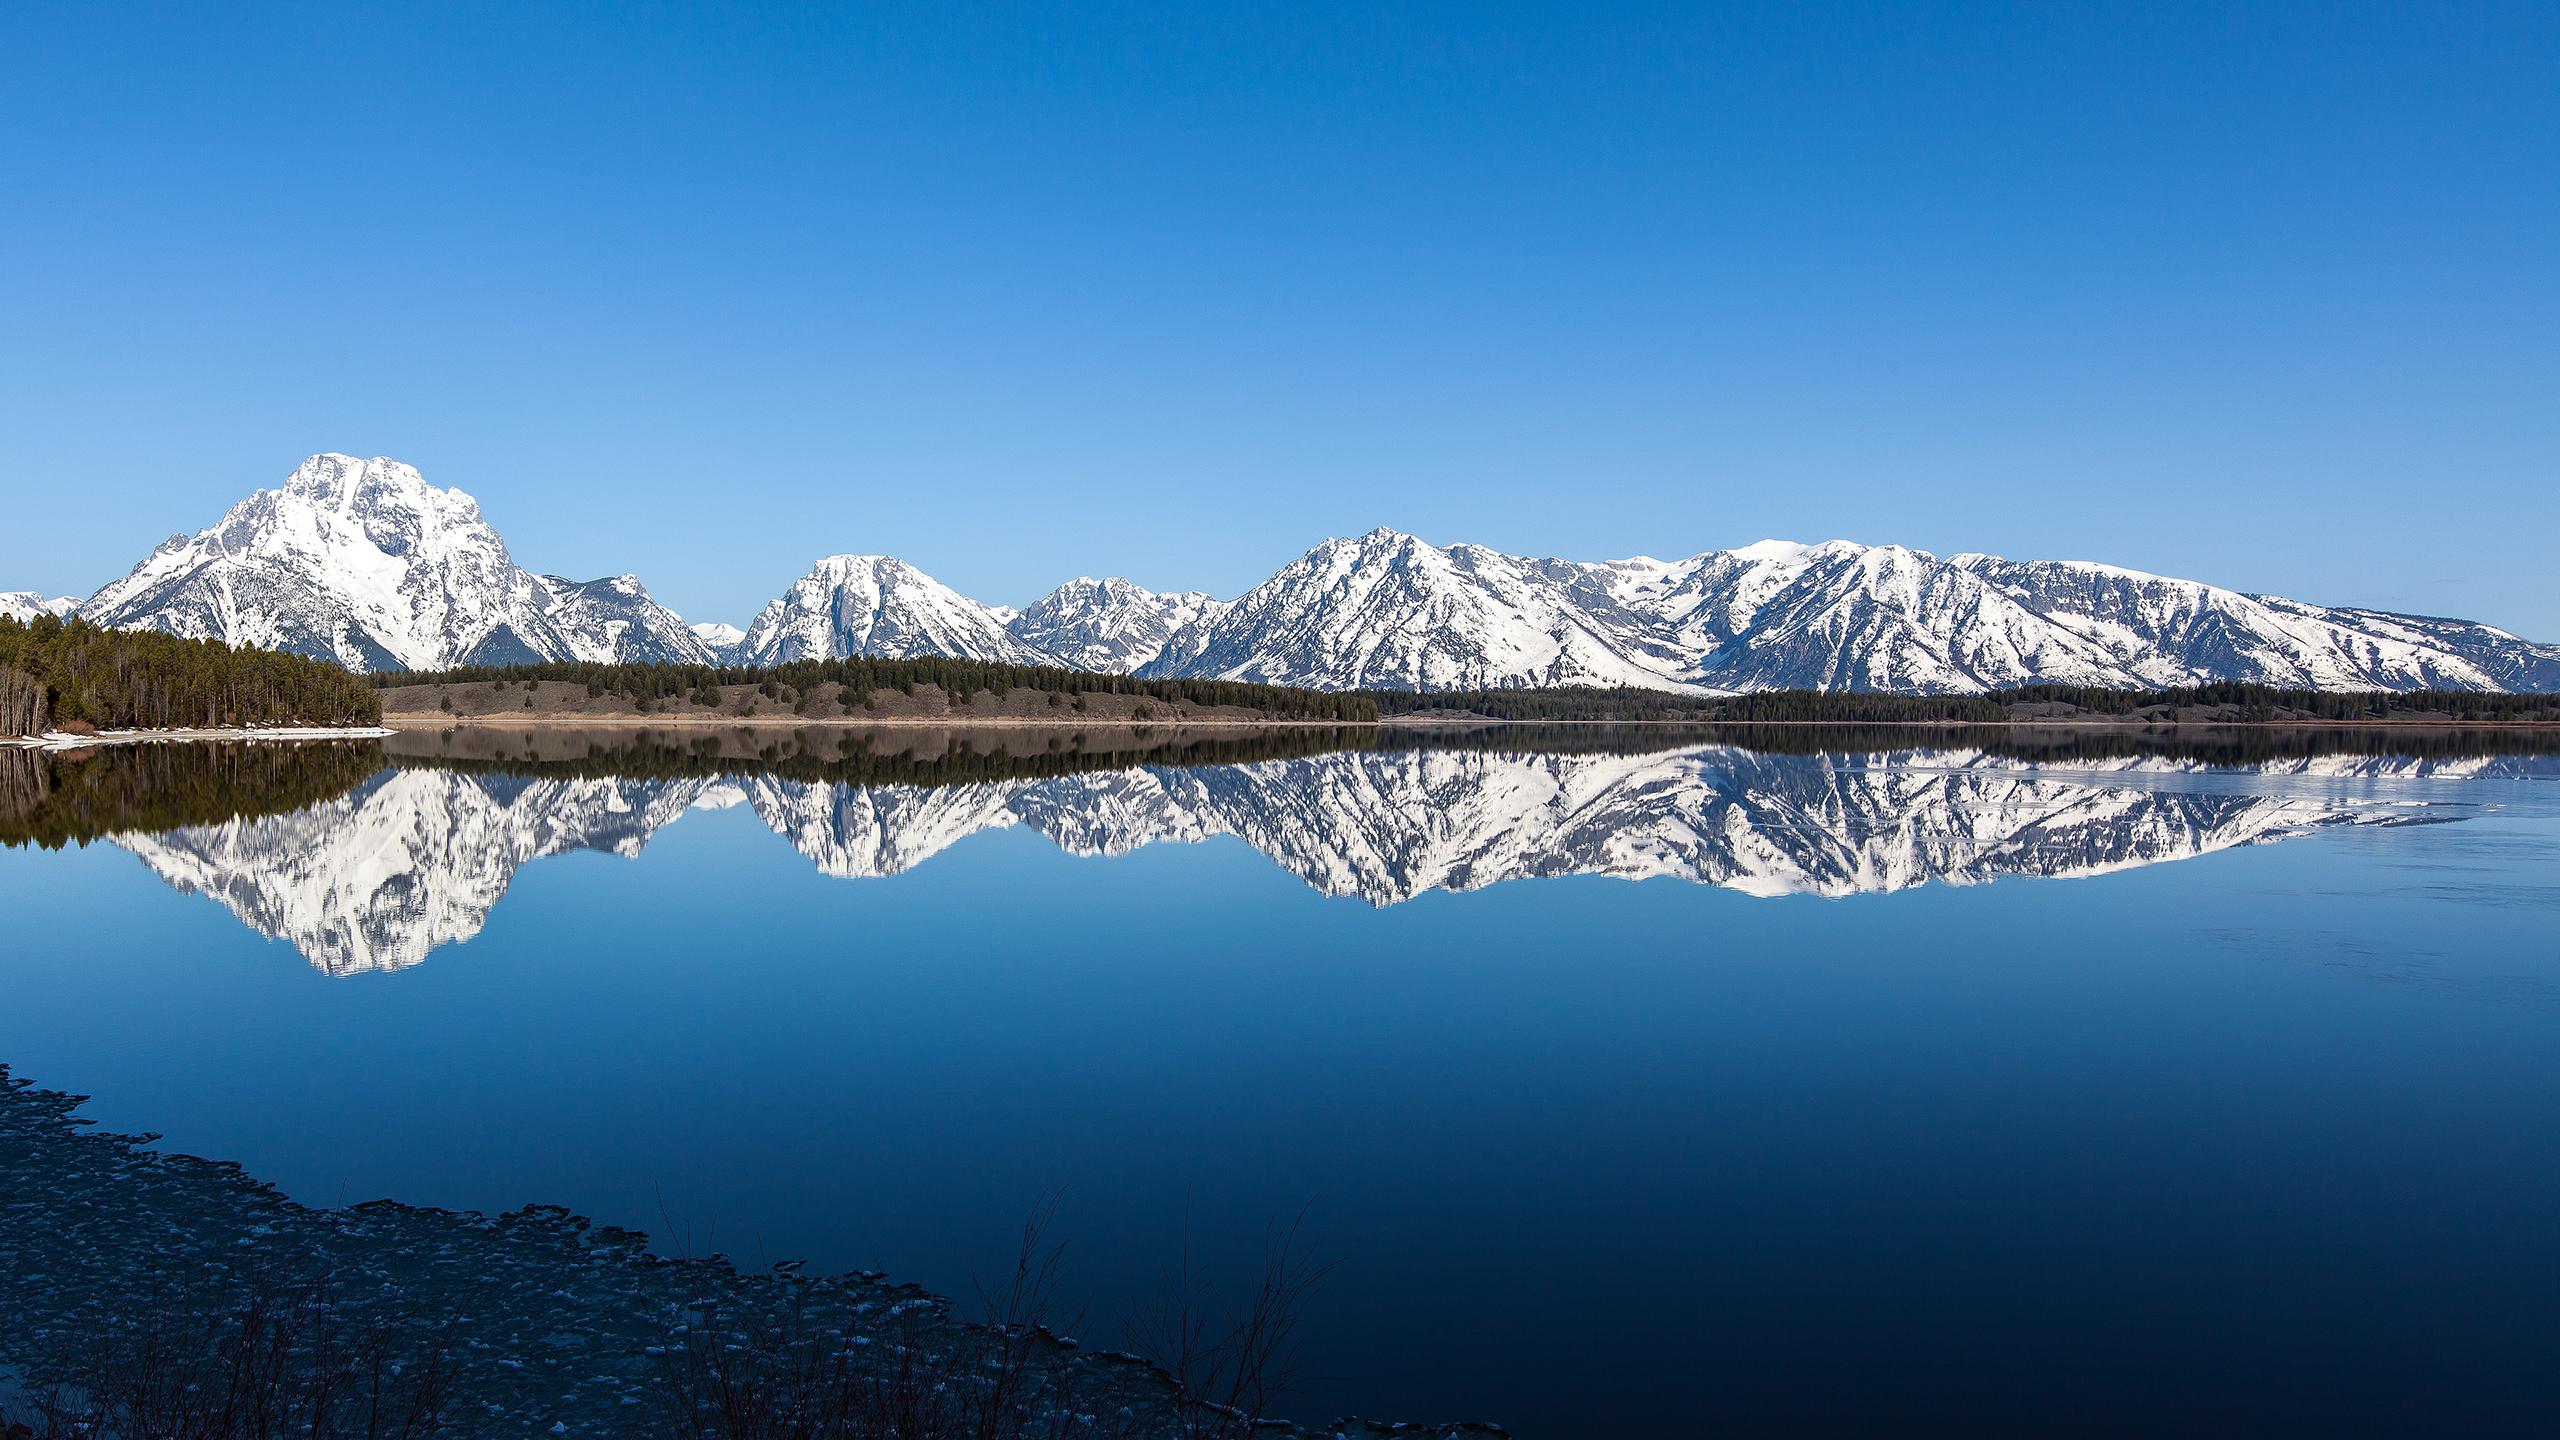 stunning_panorama_wallpaper_2560x1440